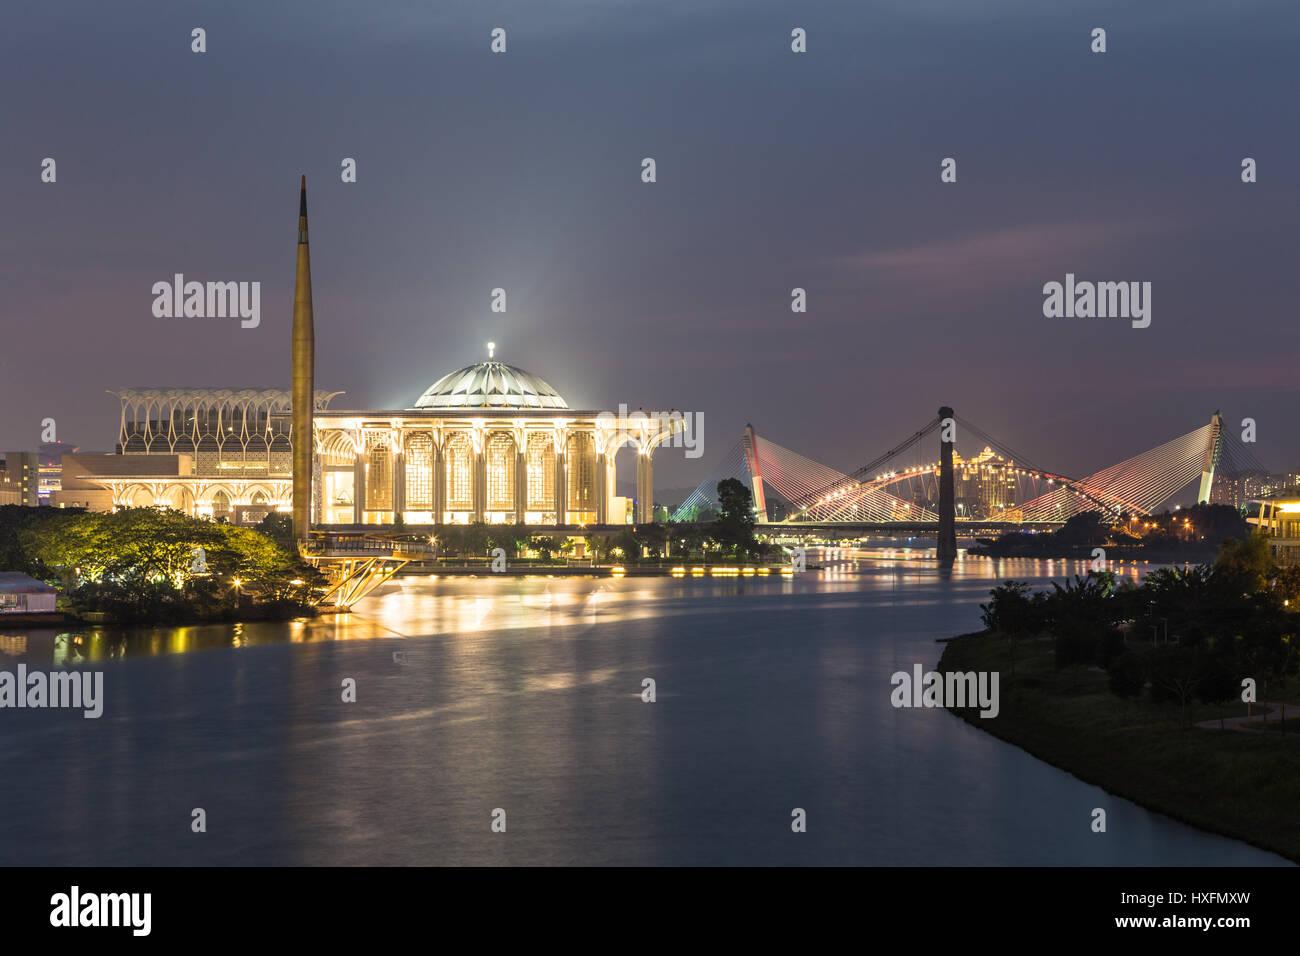 Masjid Tuanku Mizan Zainal Abidin (Iron mosque) and other landmarks view from the Seri Wawasan bridge  at twillight - Stock Image